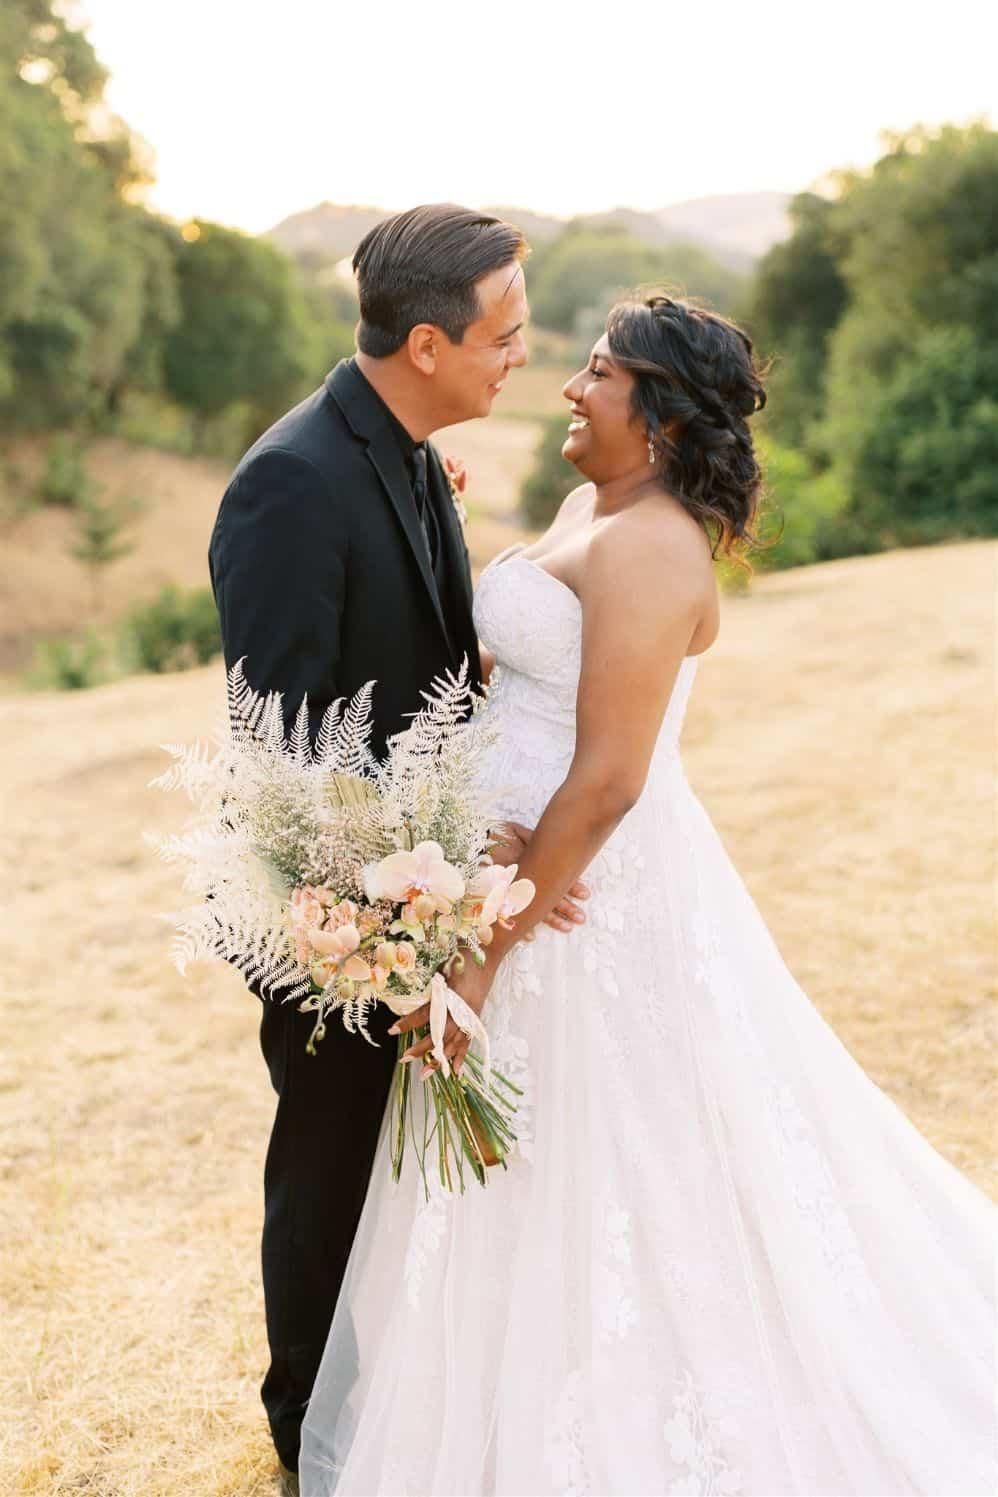 willow and ben northern california wedding photographer 36